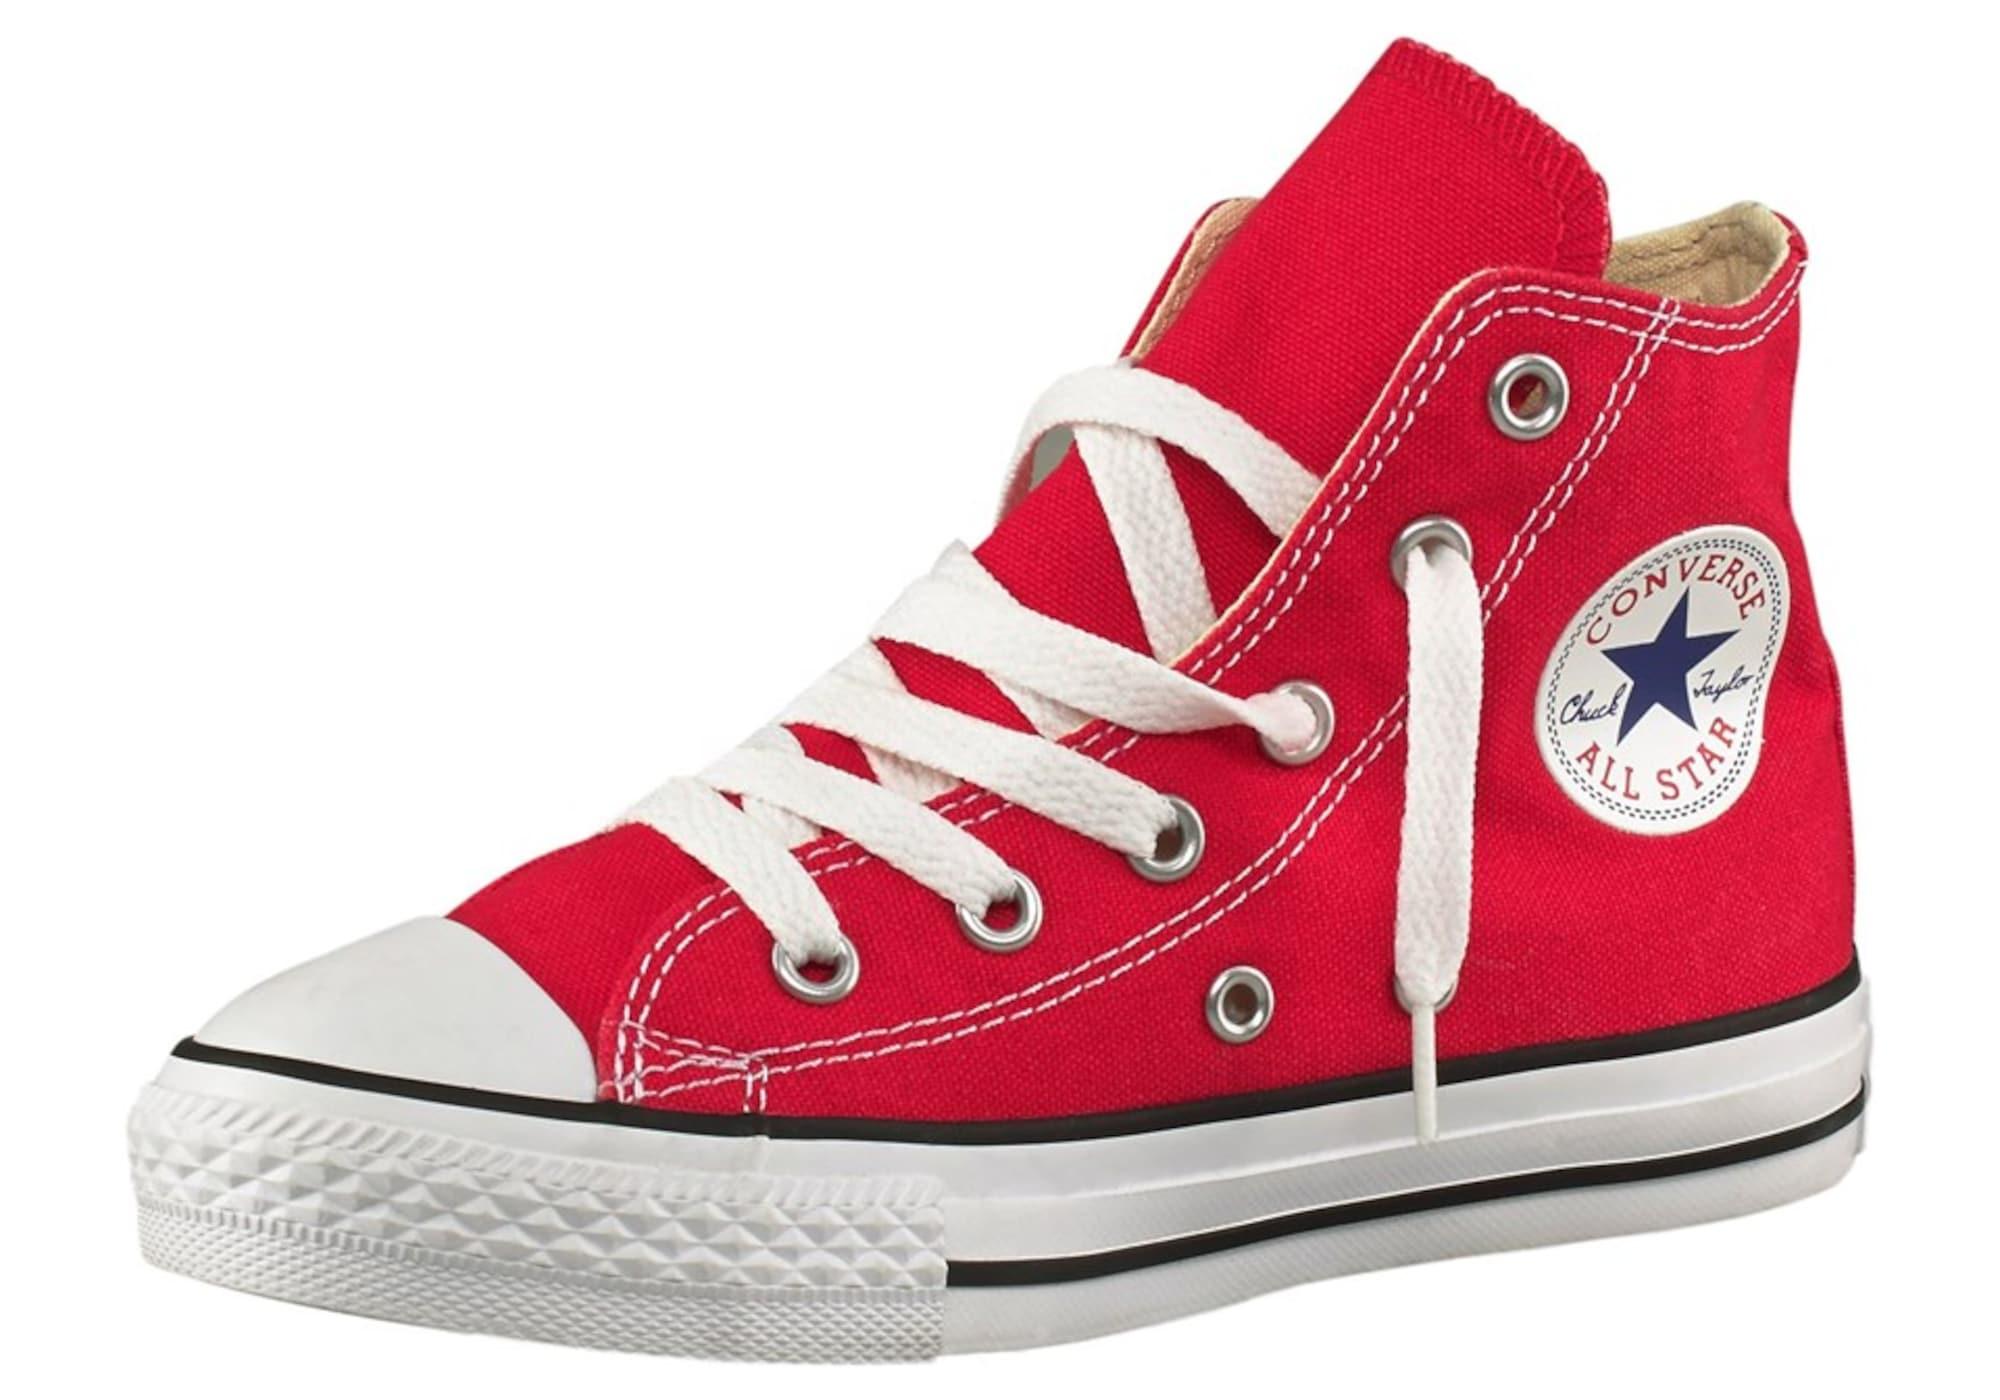 Tenisky Chuck Taylor Allstar červená černá bílá CONVERSE